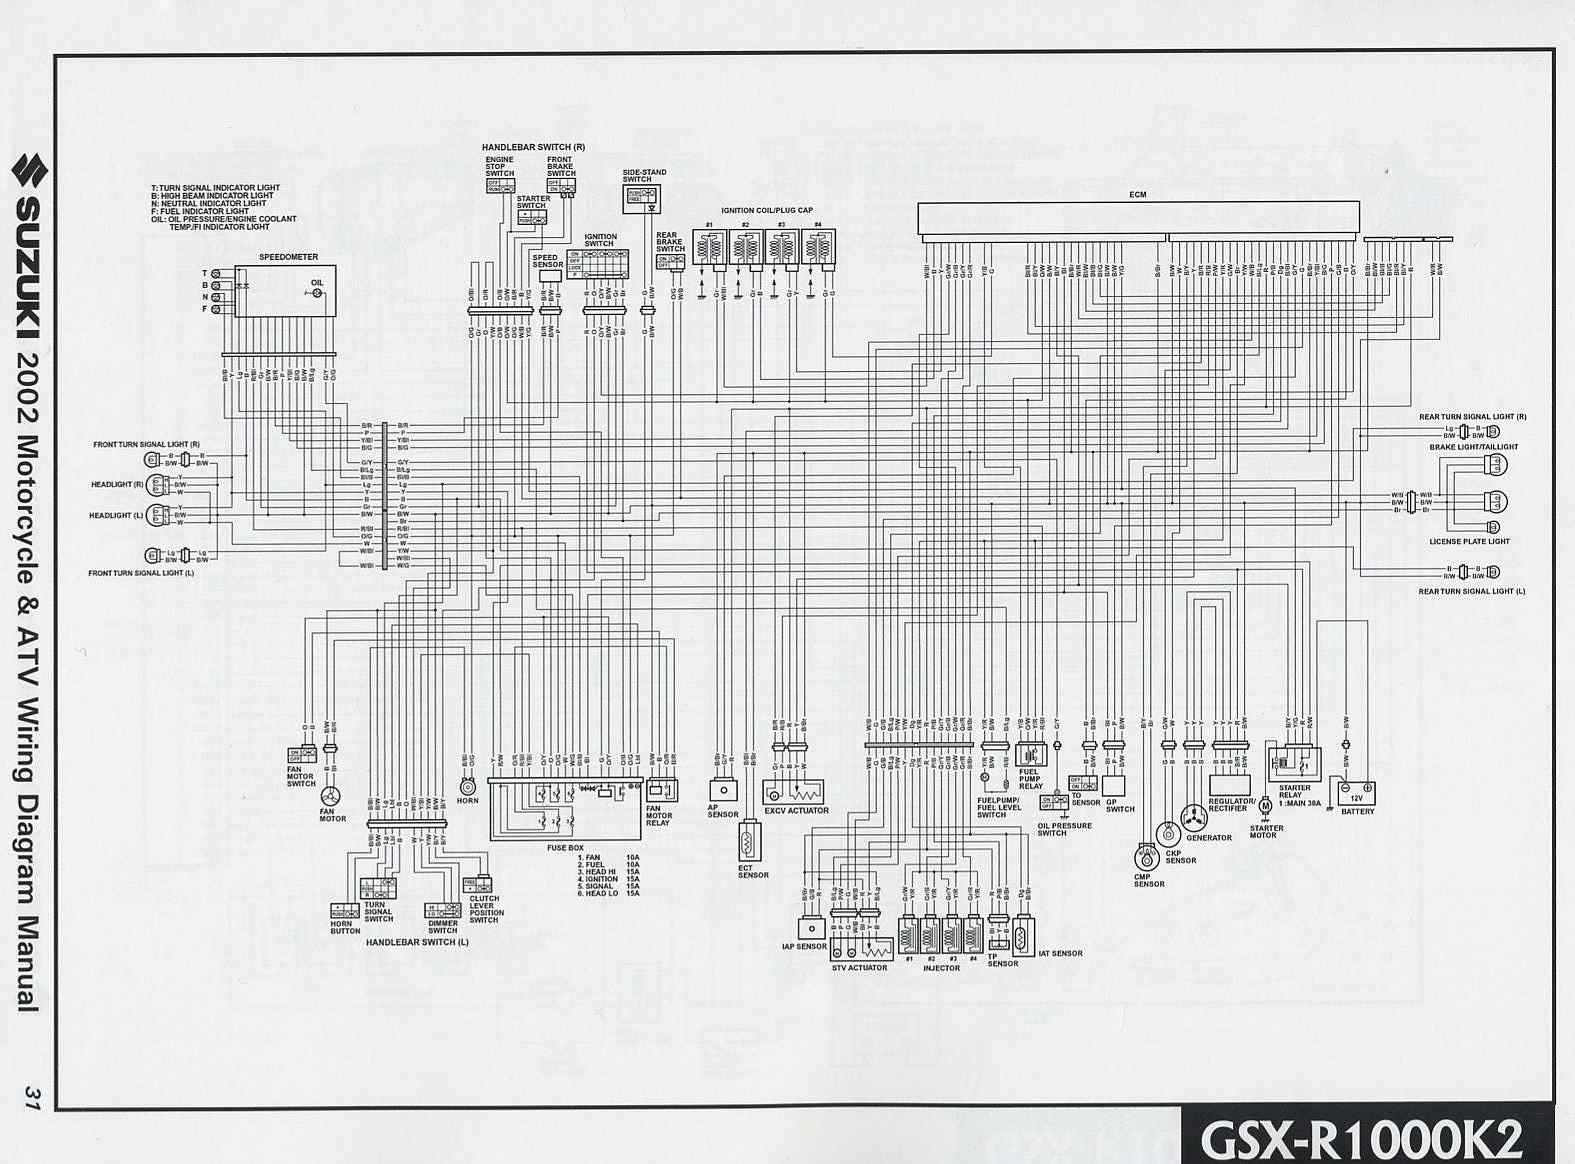 Suzuki+GSX R1000+K2+2002+Motorcycle+Wiring+Diagram?resize\=665%2C491 2002 gsxr 600 wiring diagram 2005 gsxr 600 wiring diagram \u2022 free 2002 yamaha r6 wiring diagram at edmiracle.co